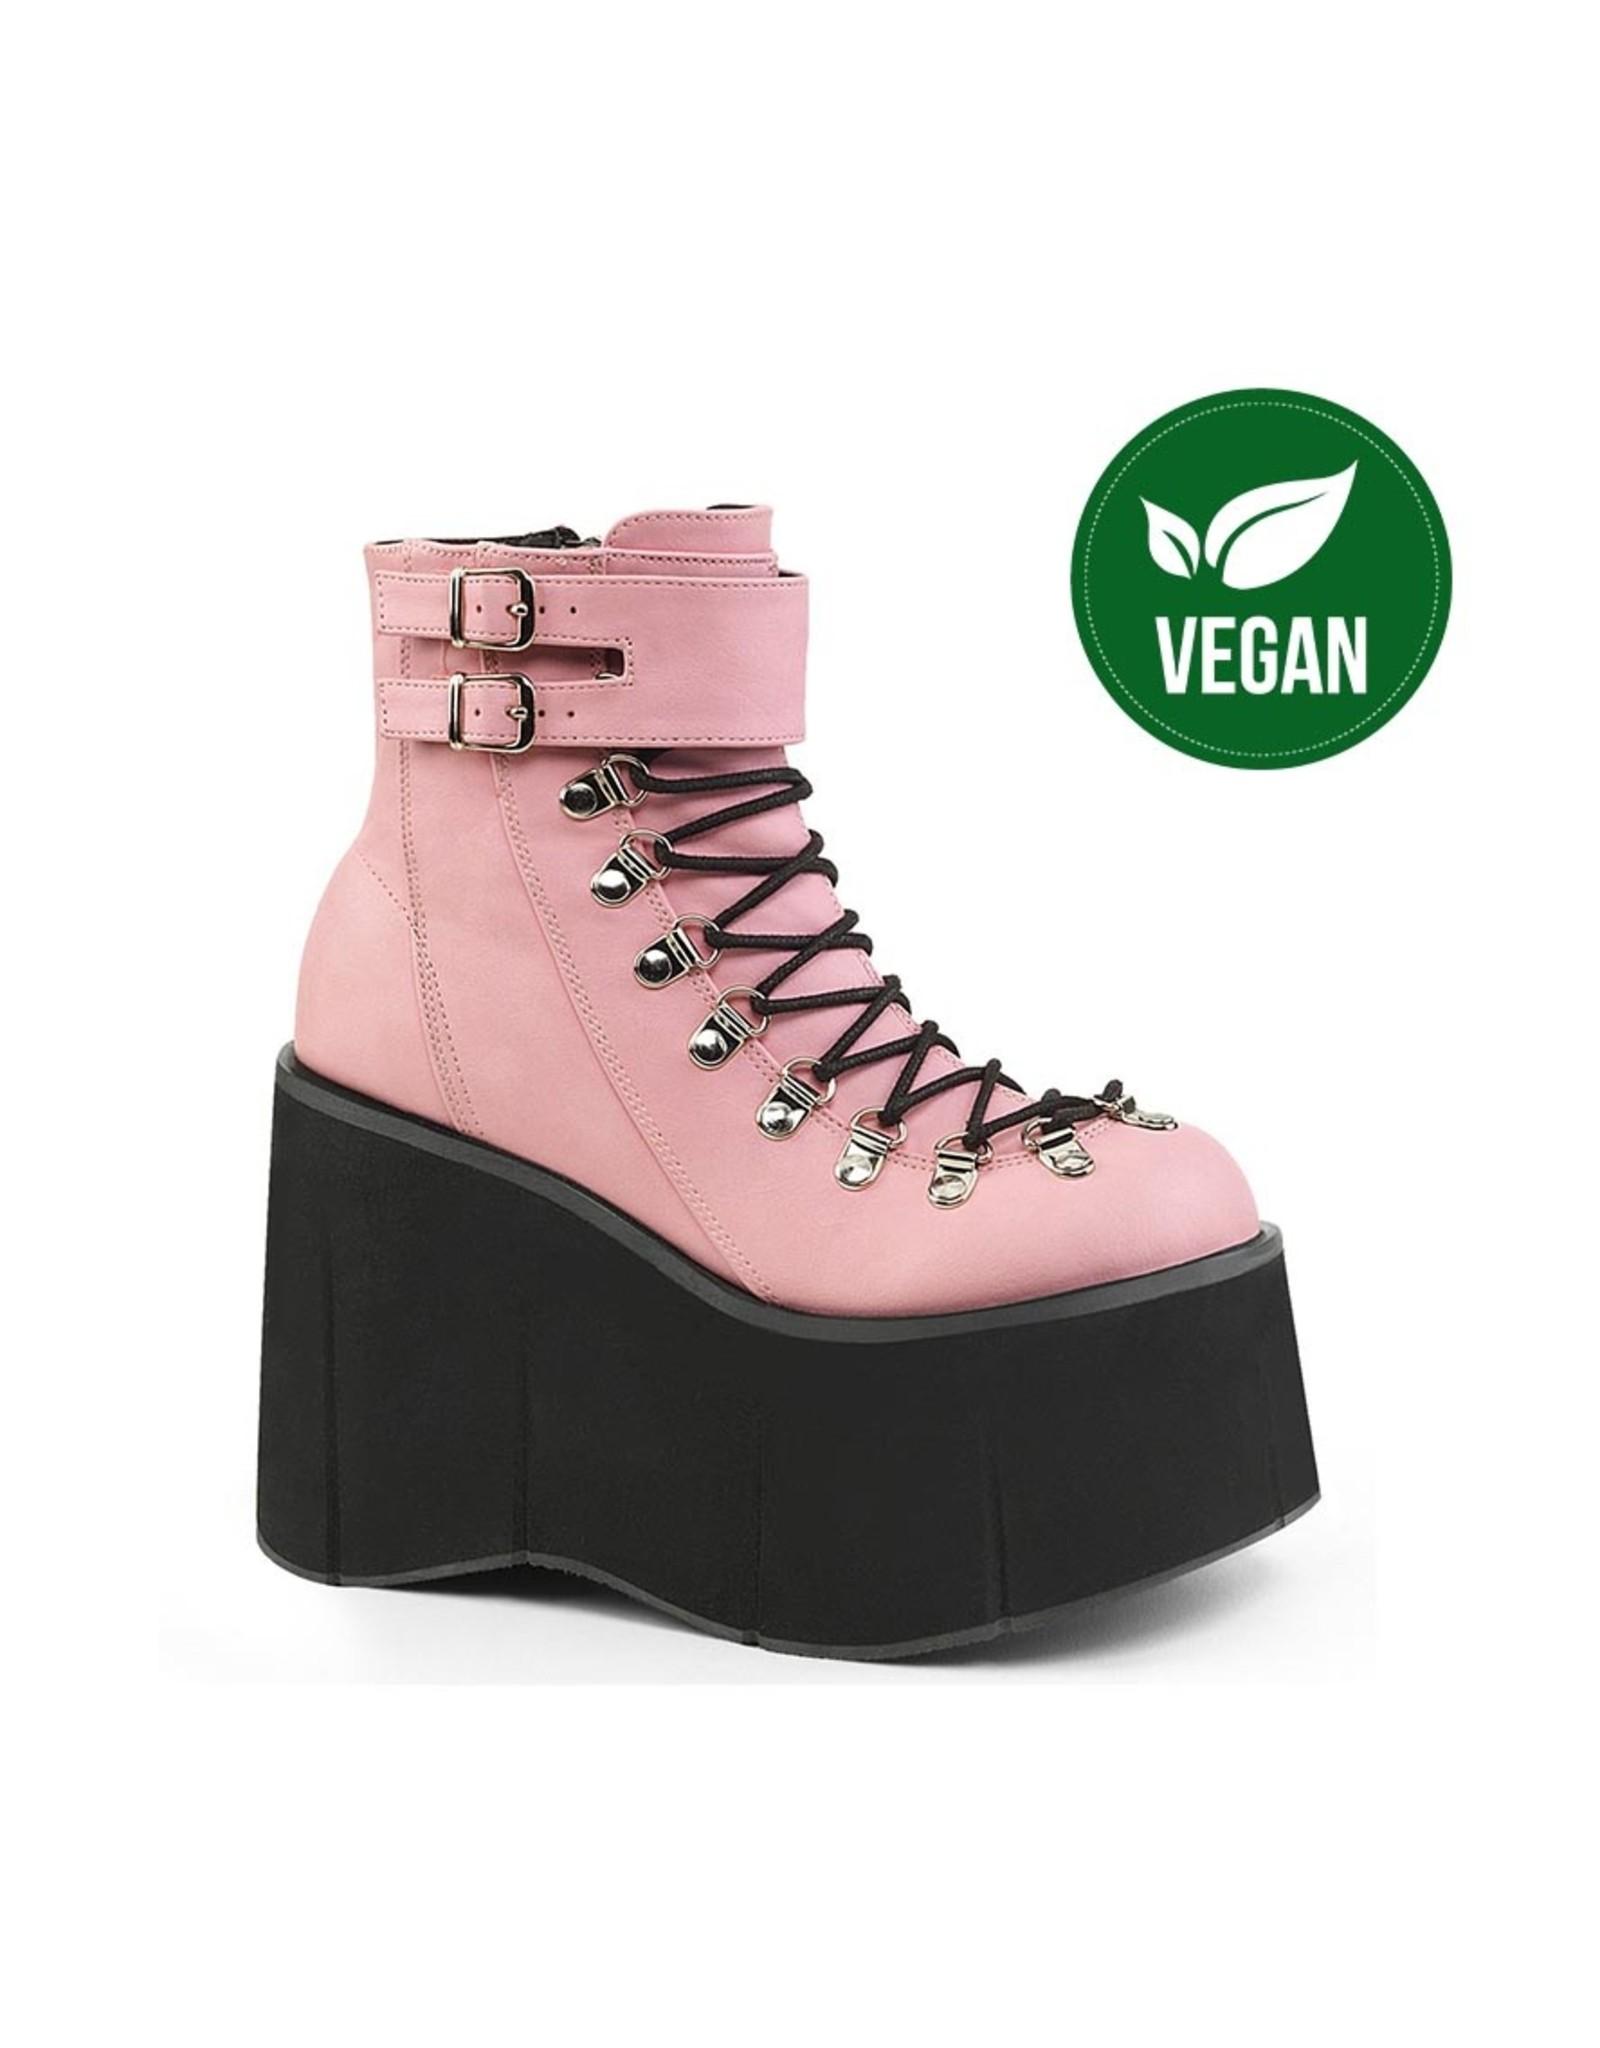 DEMONIA KERA-21 4 1/2 Pink Vegan Leather Ankle Boot, Side Zip D42VP